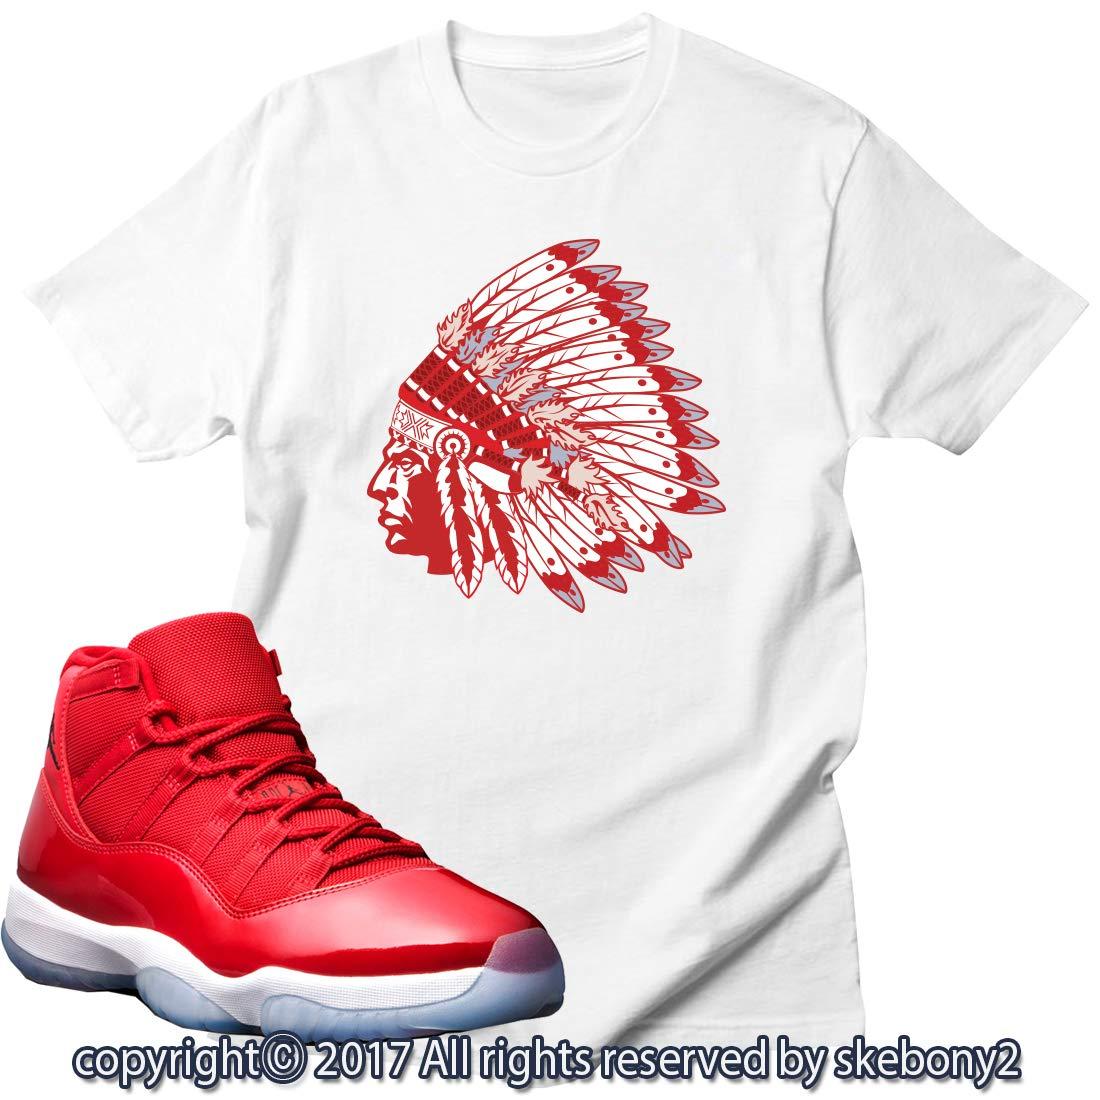 e32be8cef42b Custom T Shirt Matching AIR Jordan 11 Win Like 96 Matching TEE Bulls red JD-